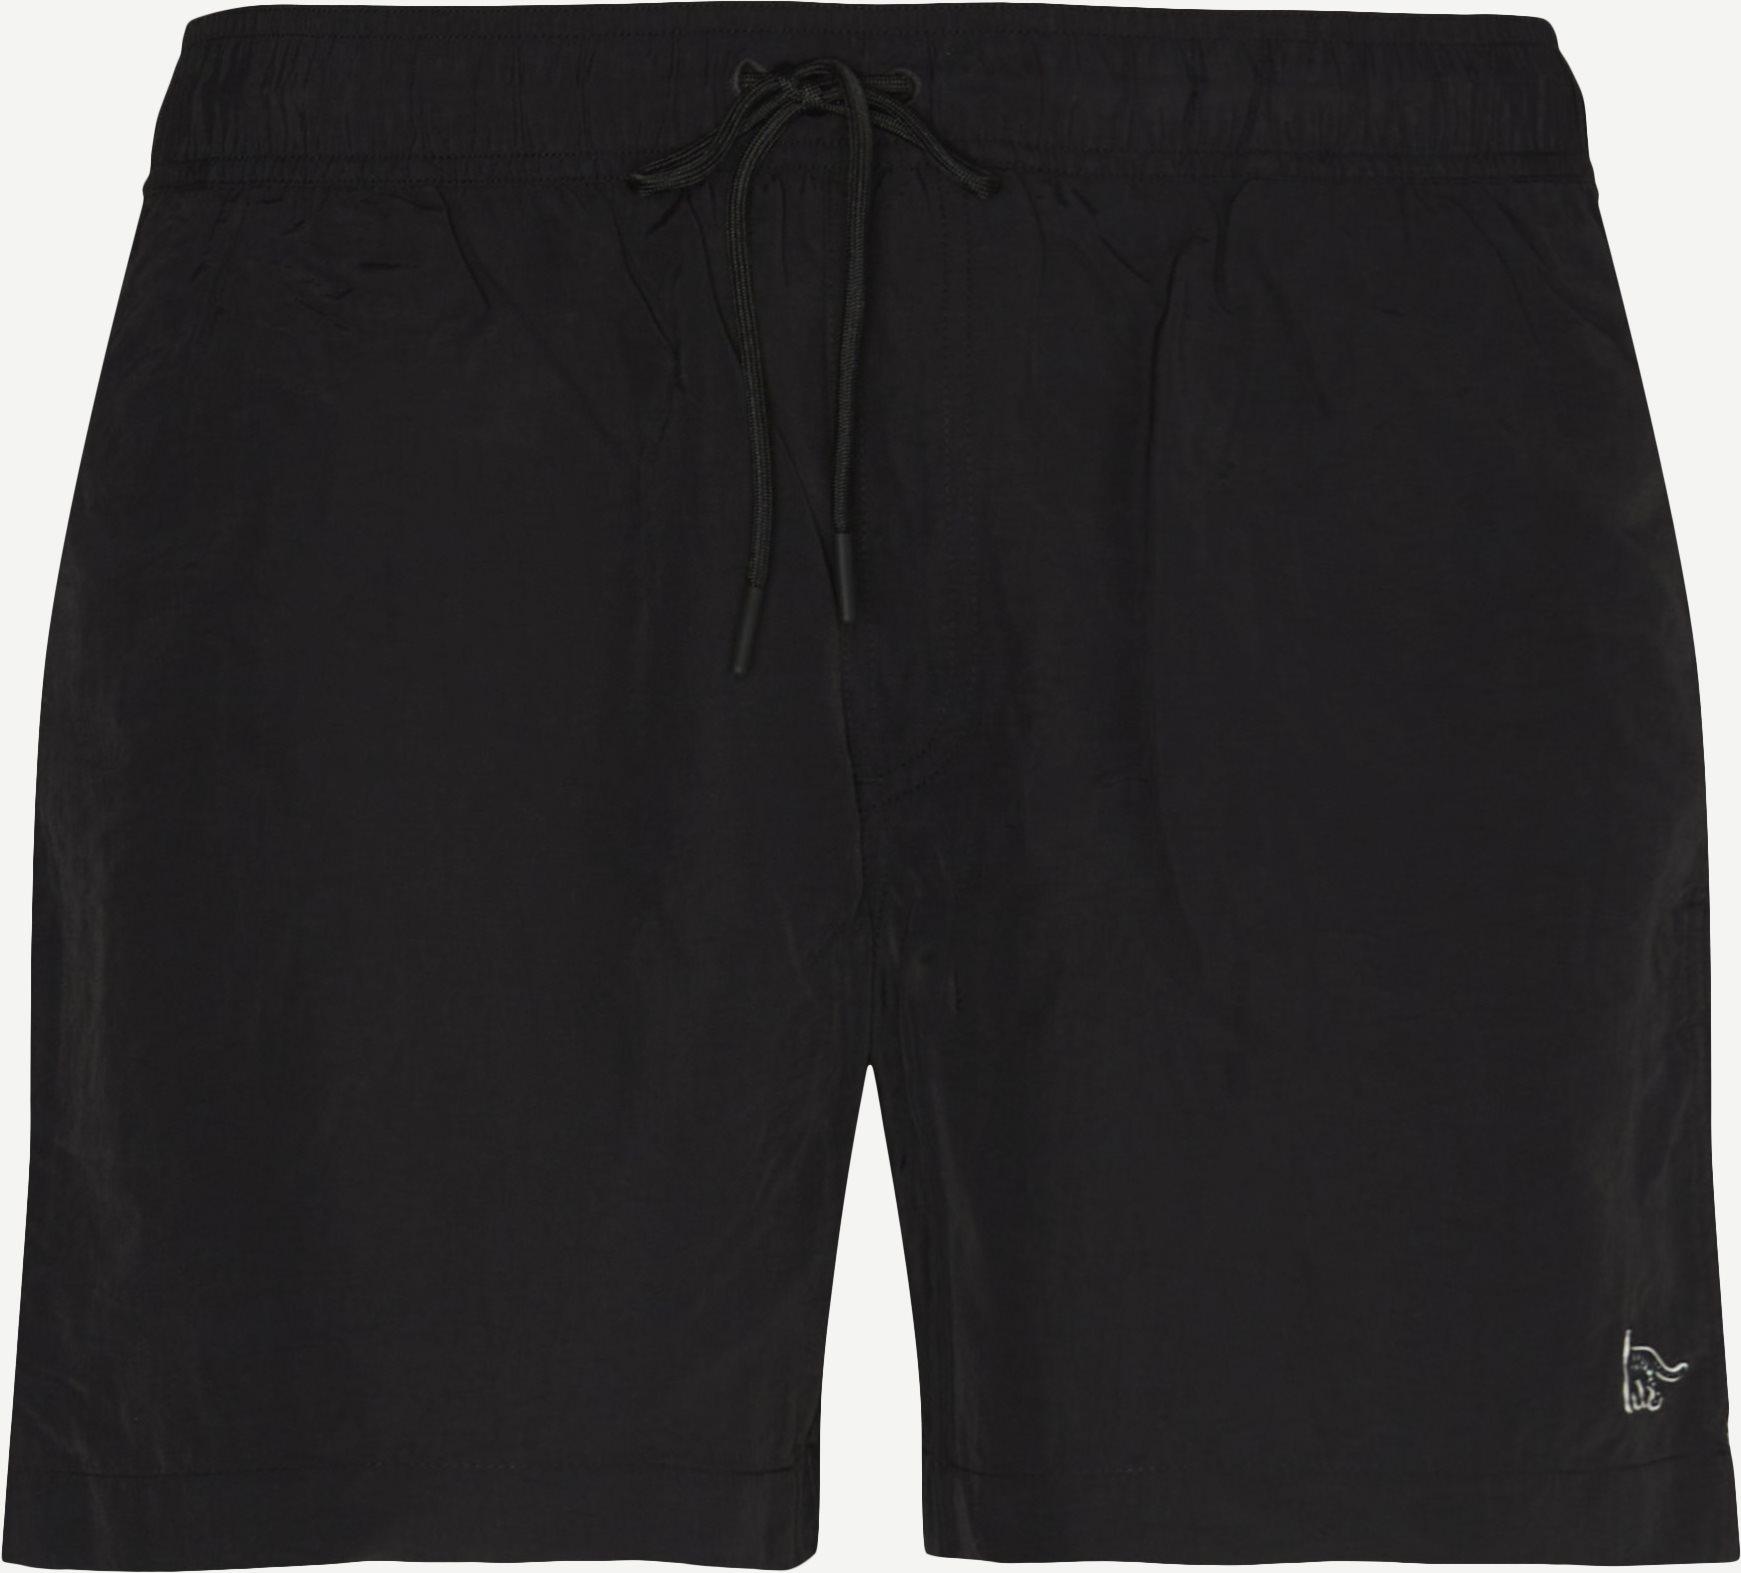 Shorts - Regular fit - Schwarz